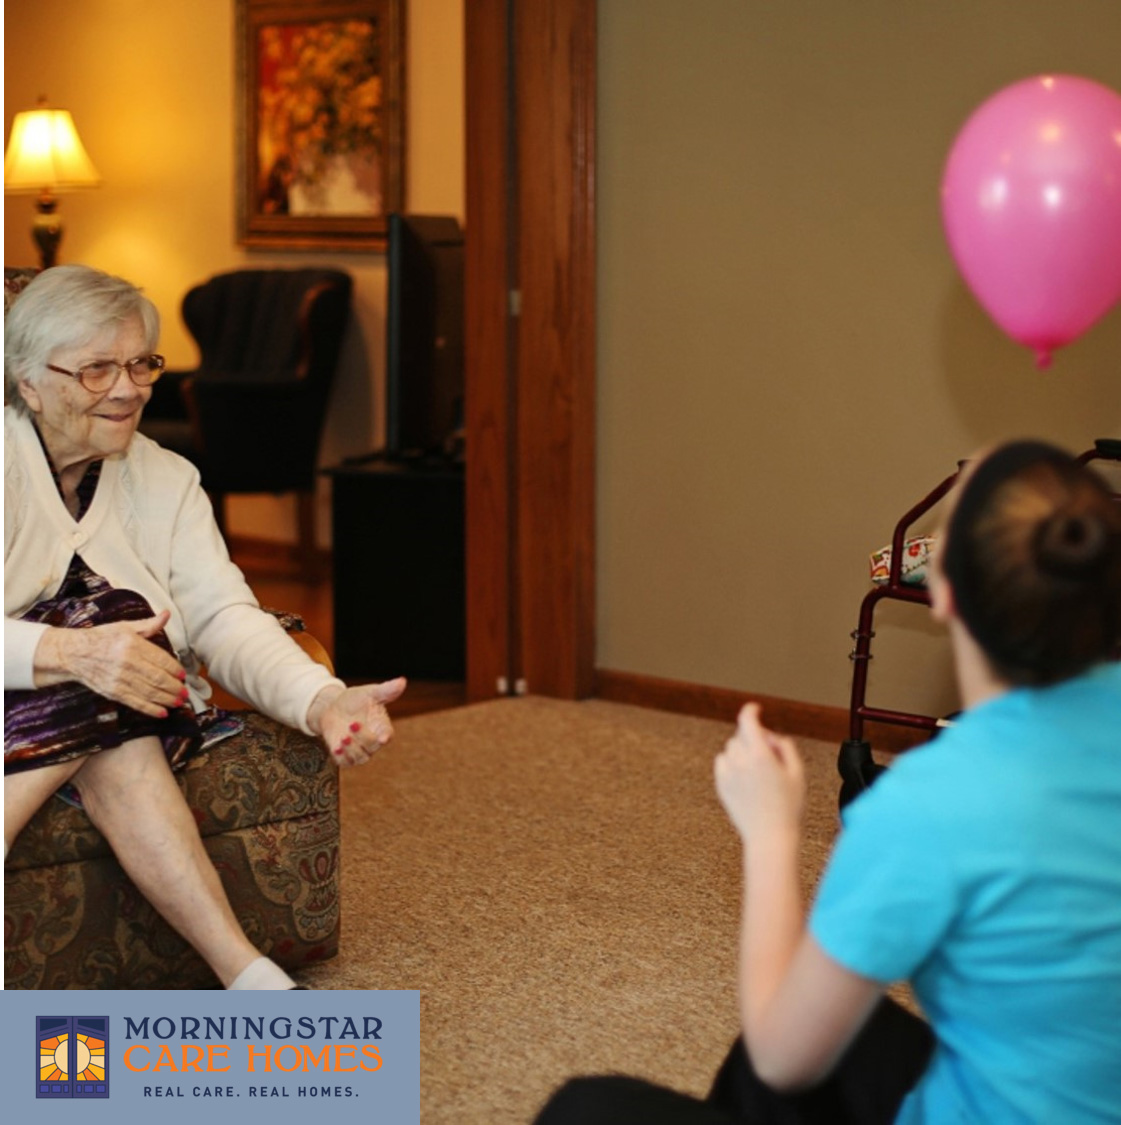 Morningstar-Care-Homes-square-001